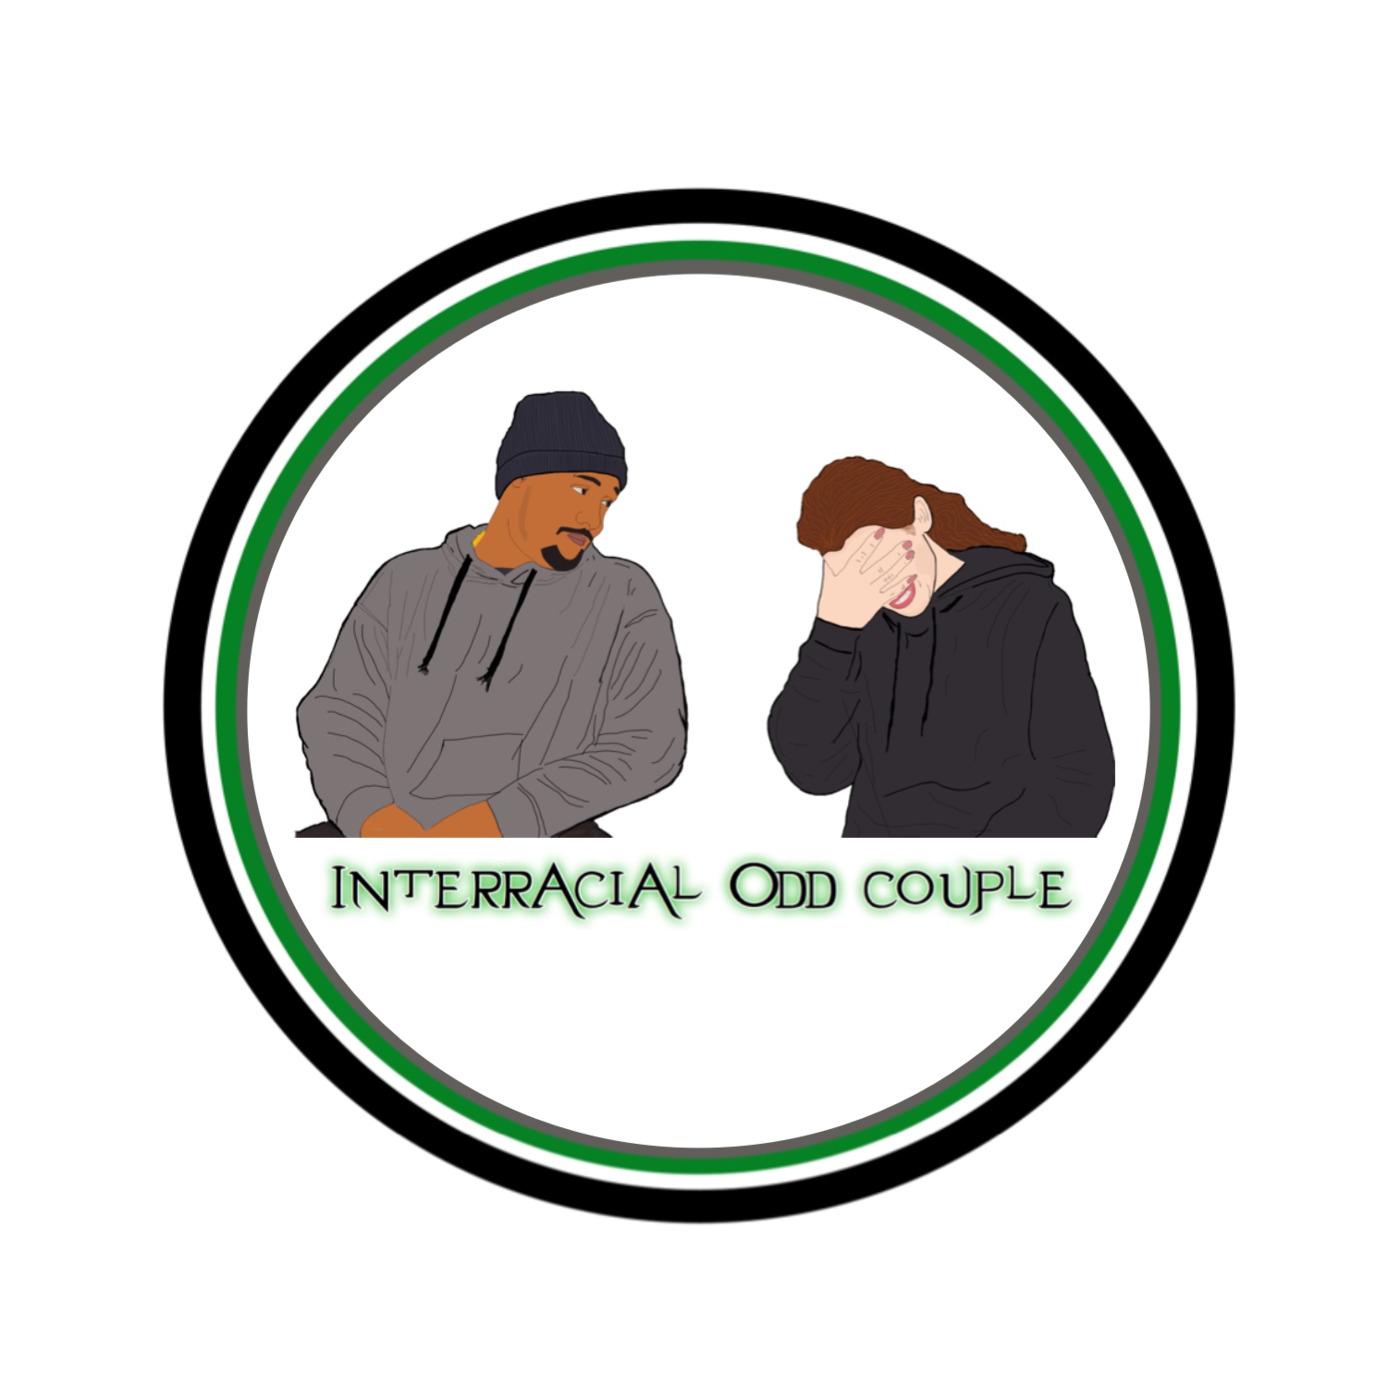 Interracial Odd Couple S03E1 - Pilot Cypha Omni Network podcast